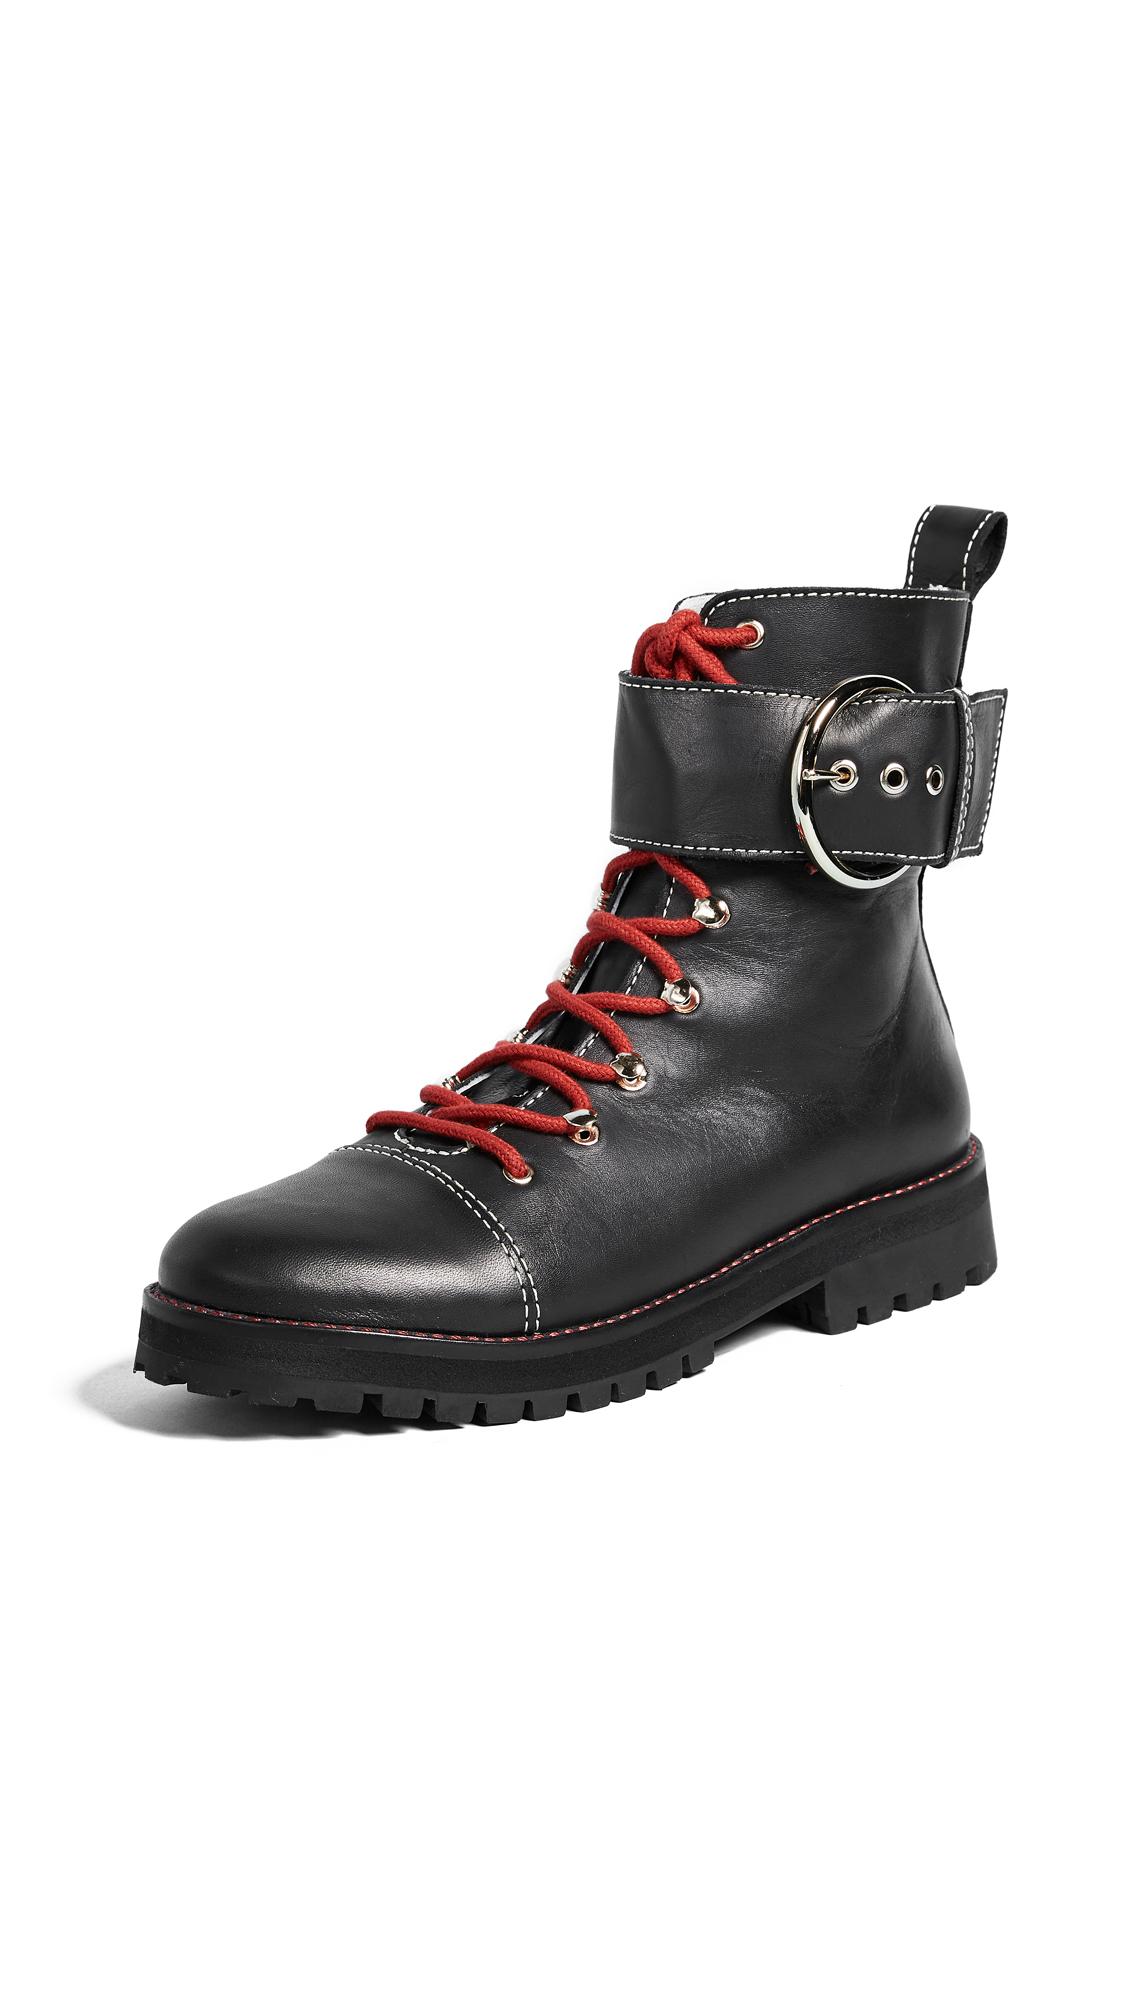 Frances Valentine Sonny Combat Boots - Black